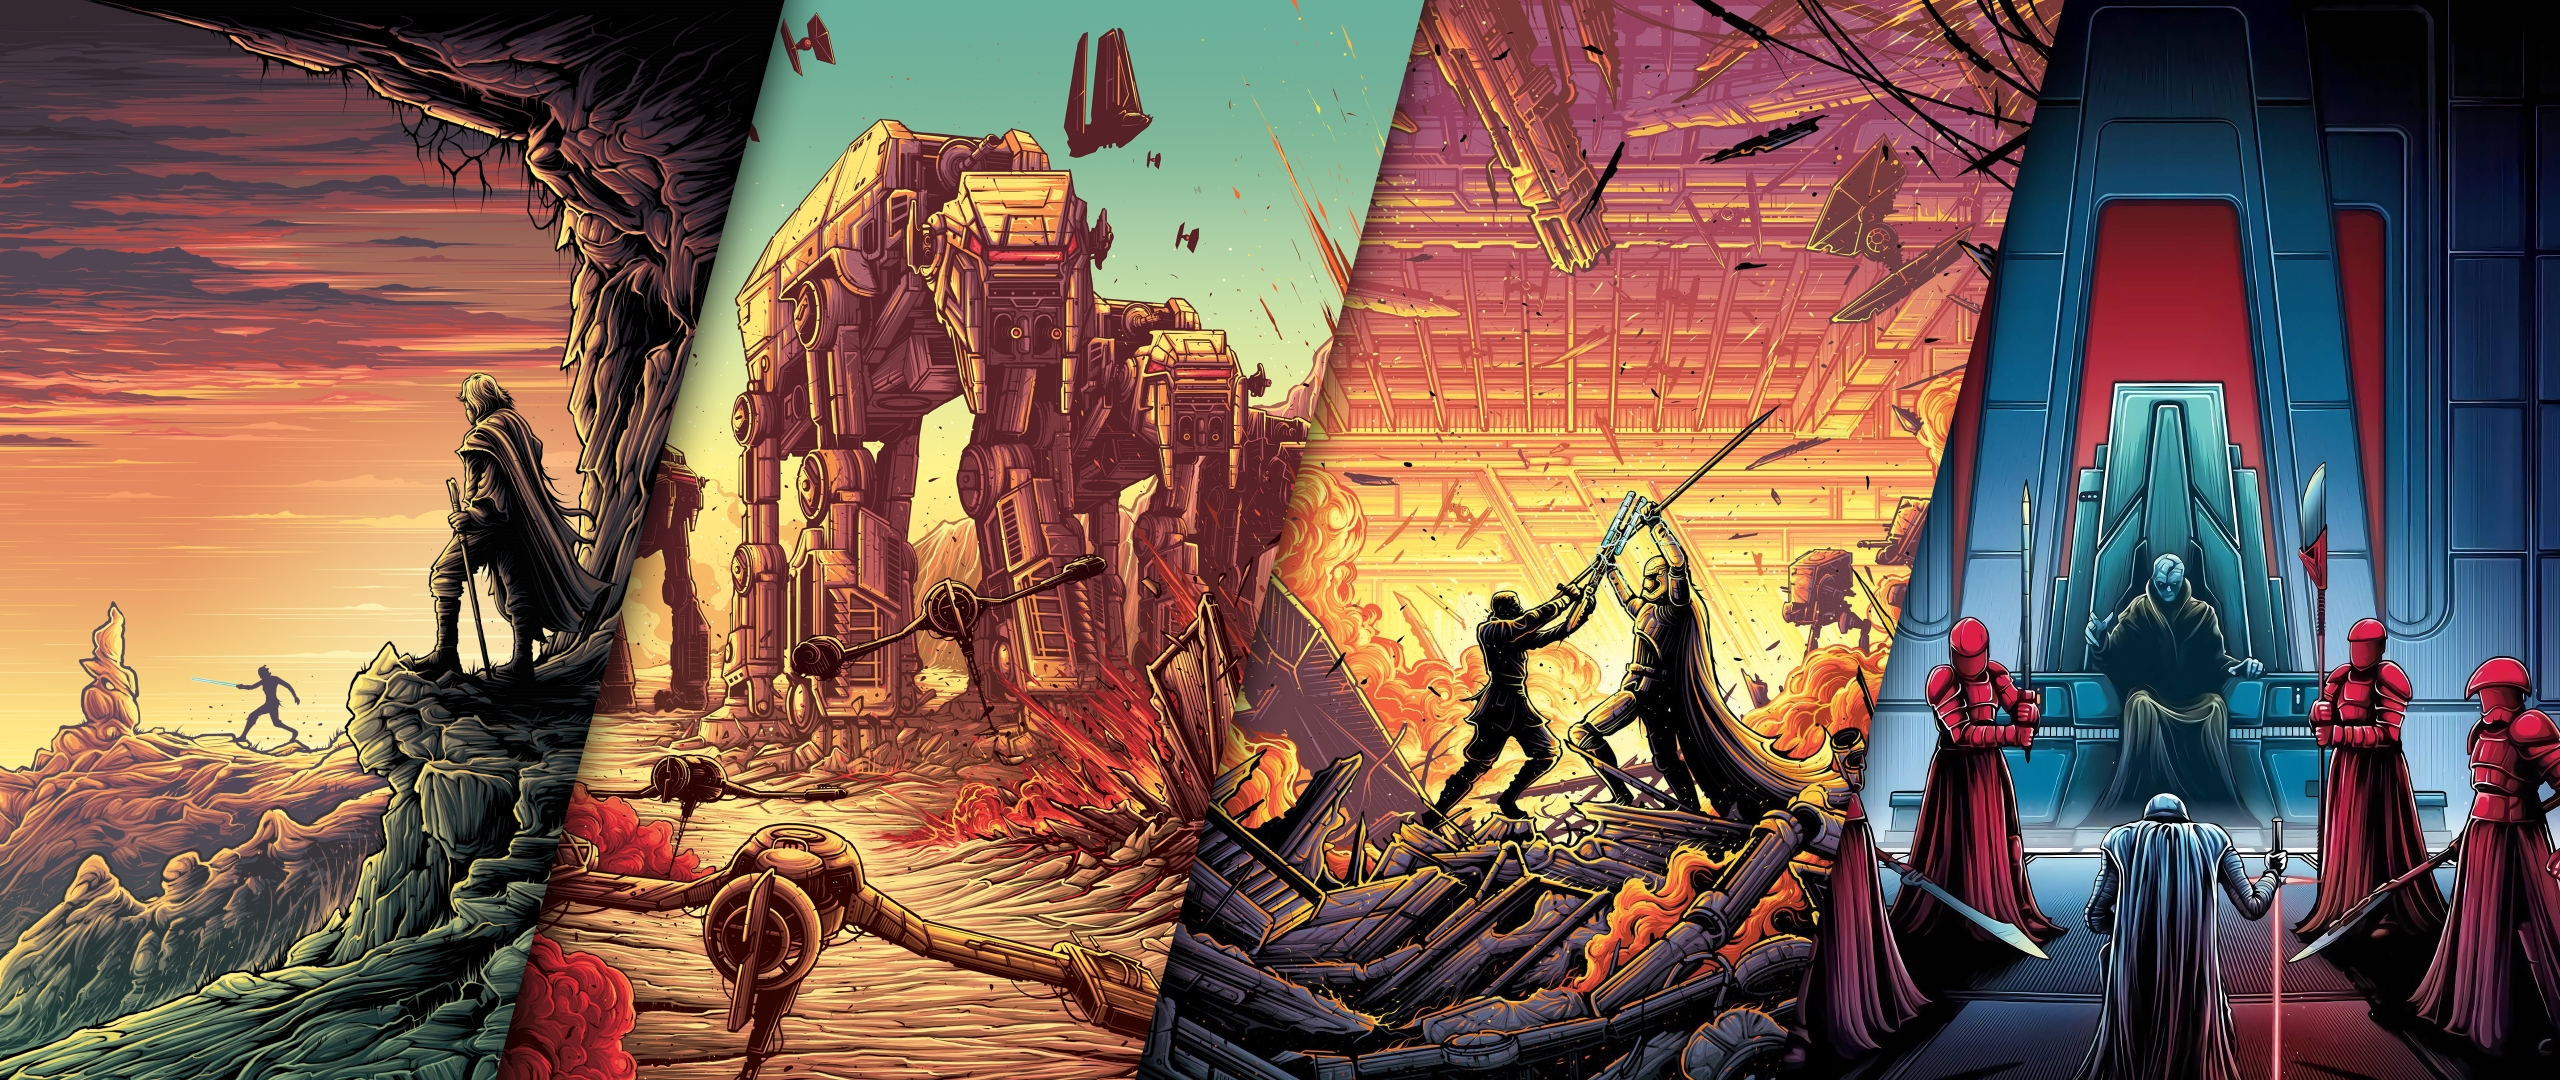 2560x1080 Wallpaper Star Wars Posted By Samantha Peltier